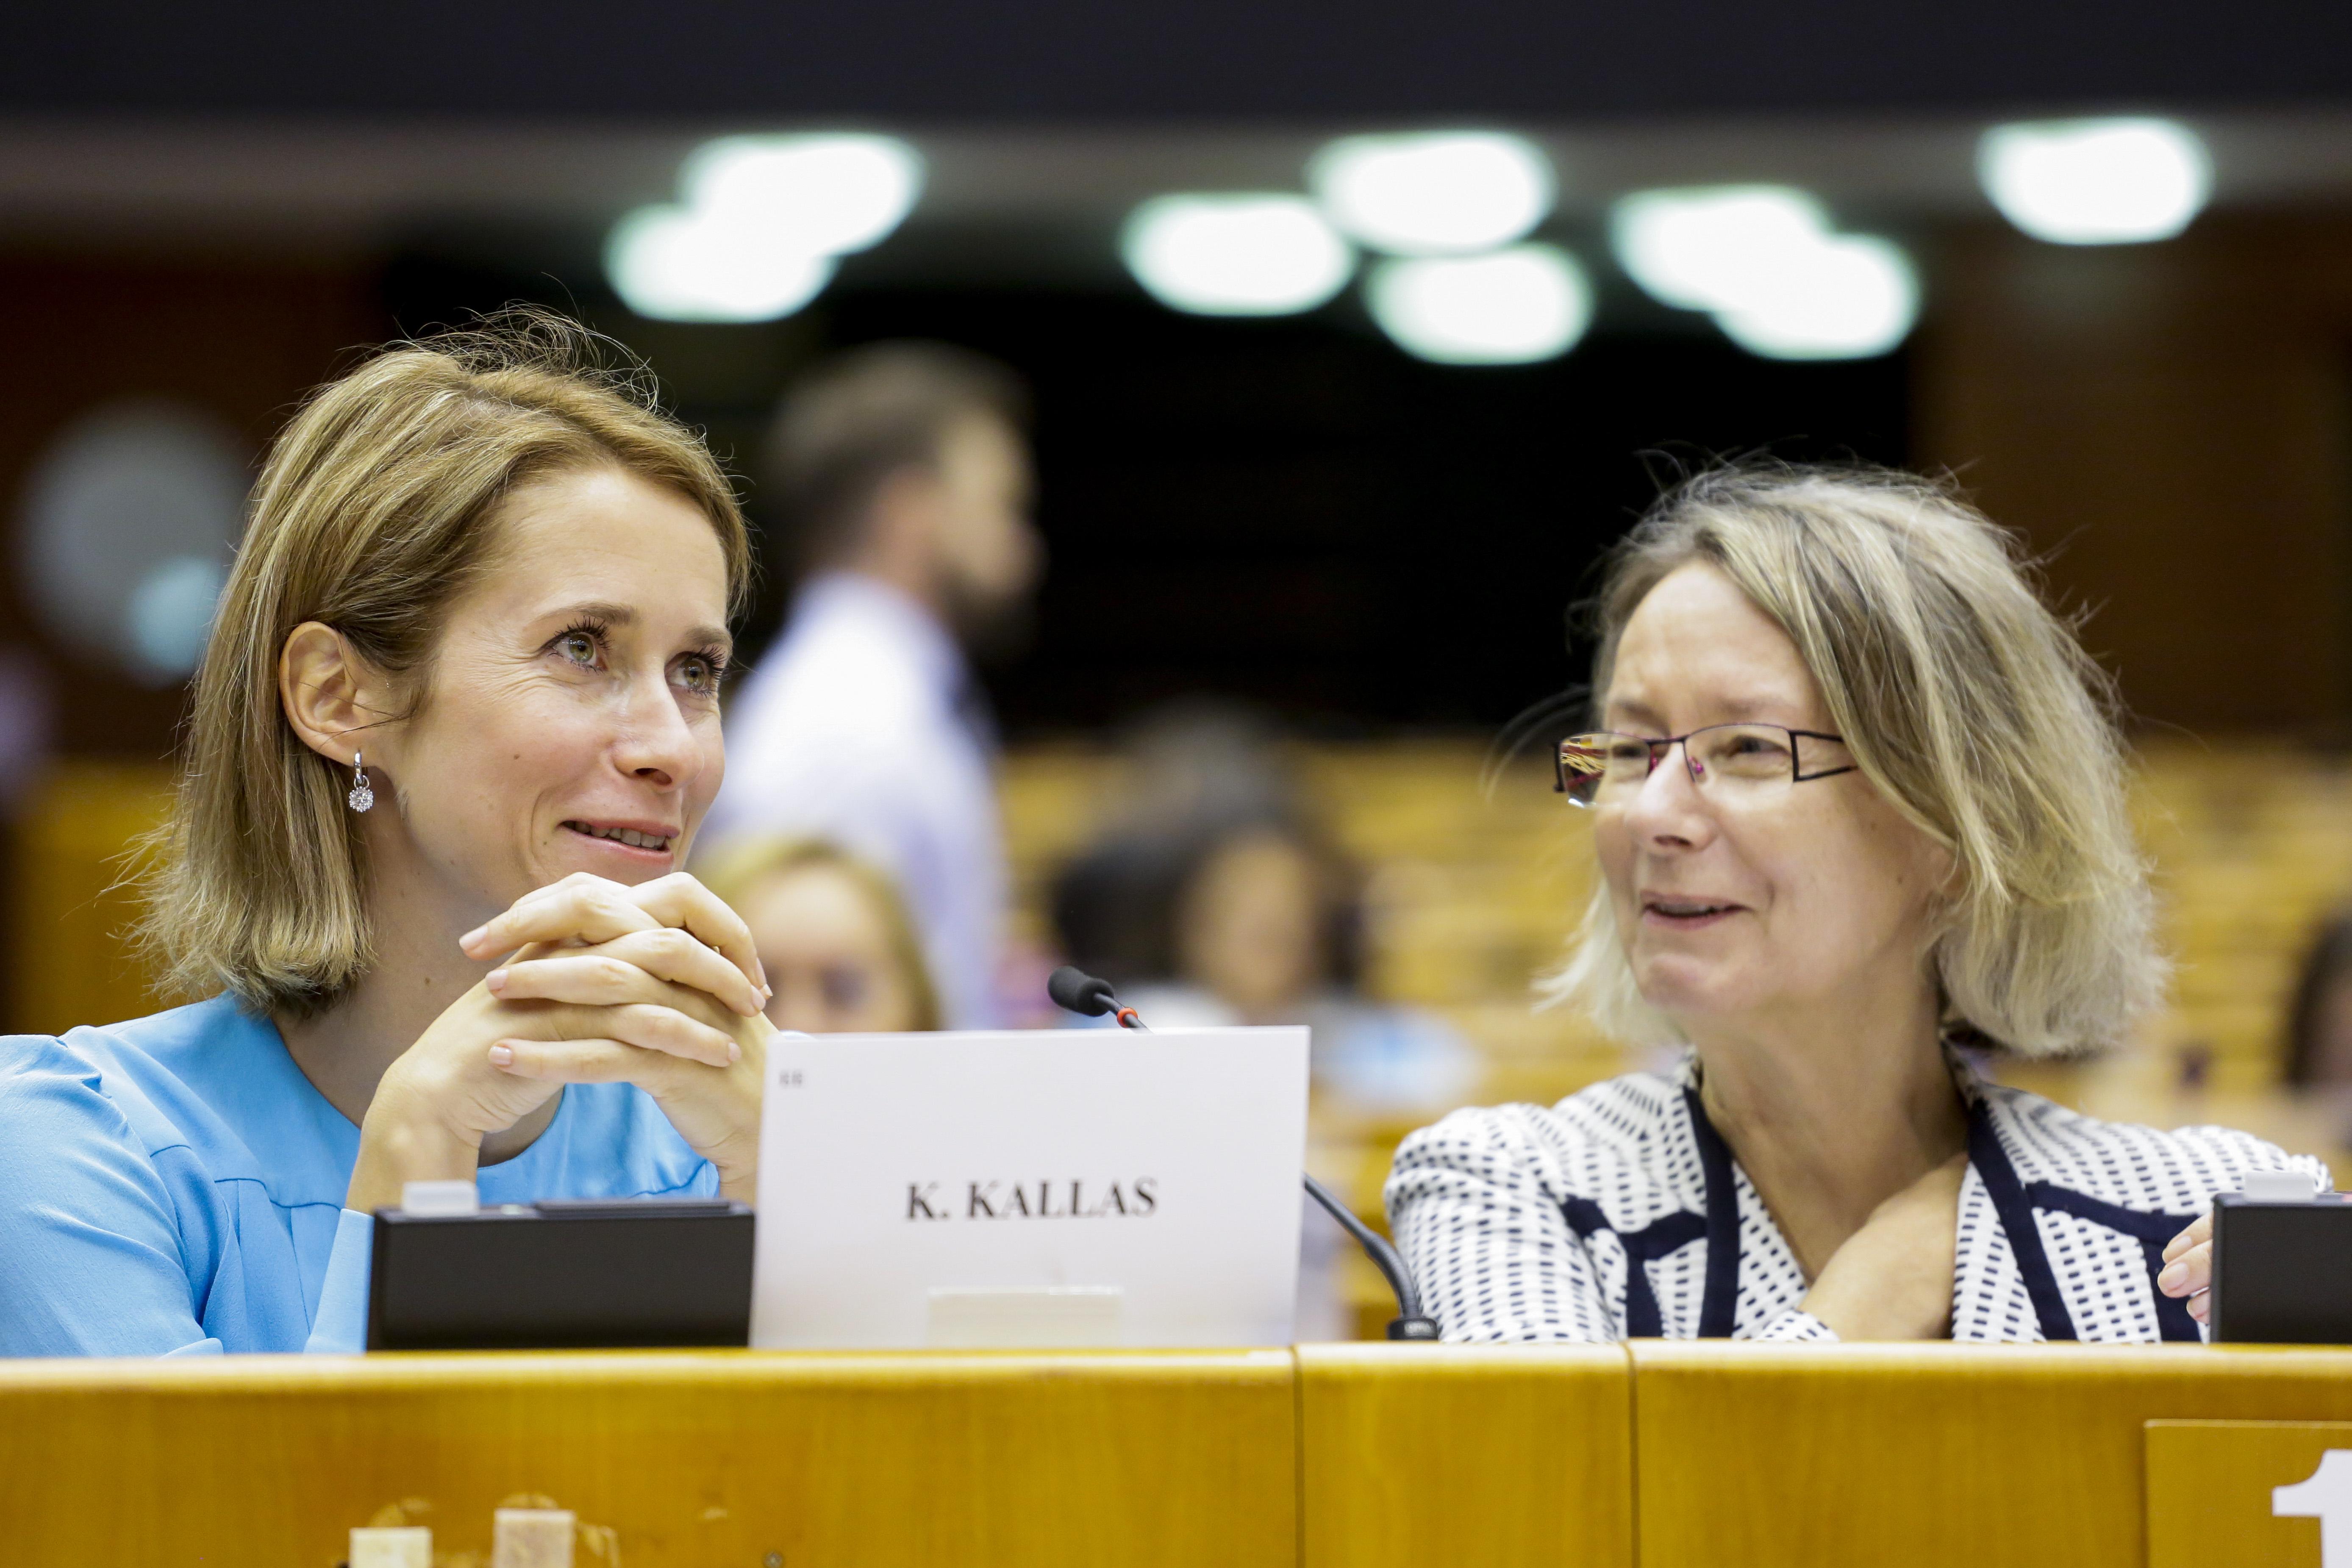 KALLAS, Kaja (ALDE, EE), GEBHARDT, Evelyne (S&D, DE)